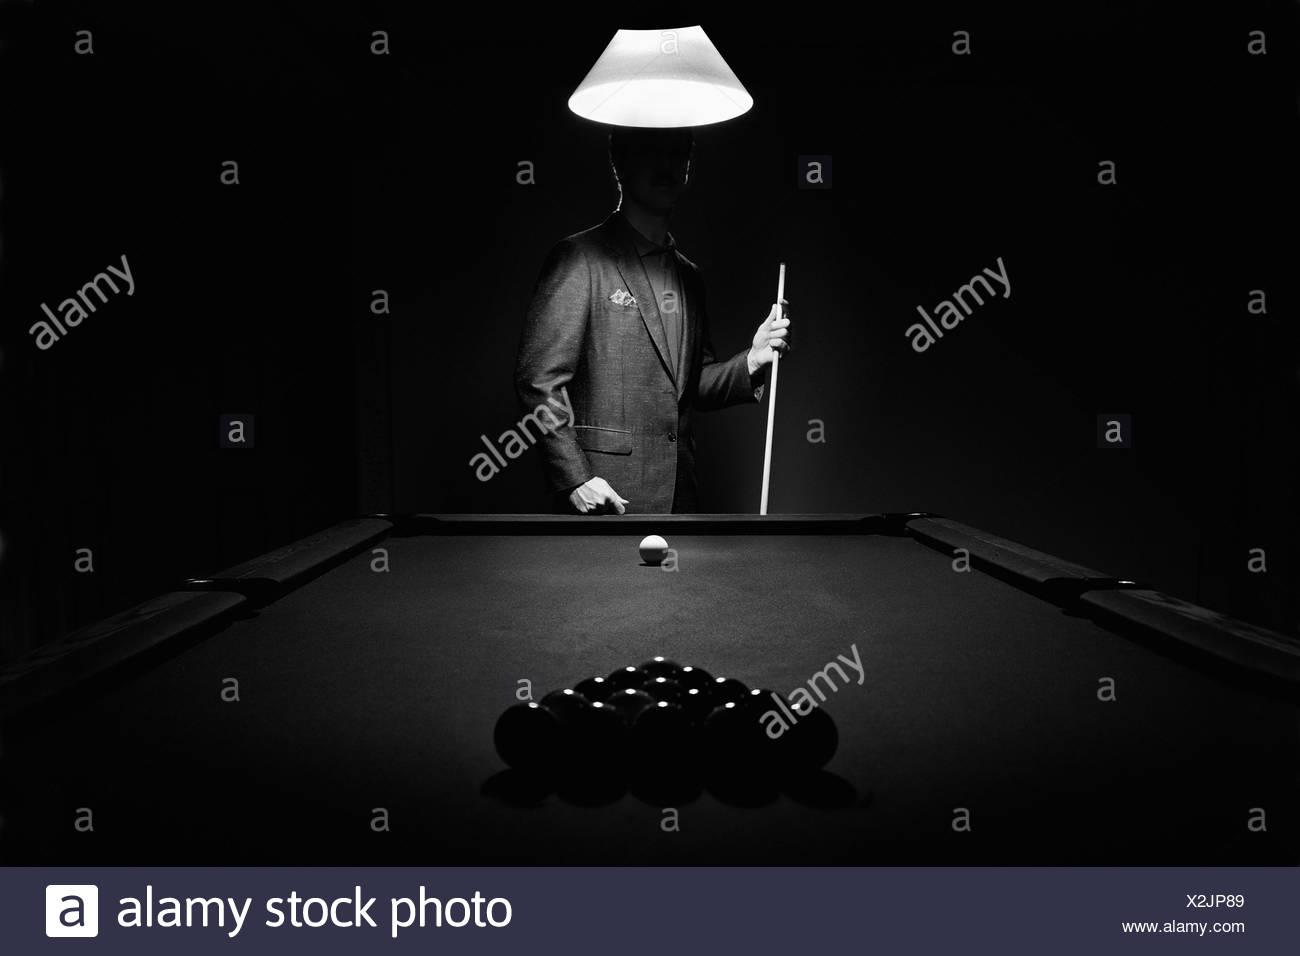 Geheimnis-Billardspieler hinter Rack von Billardkugeln; Edmonton, Alberta, Kanada Stockbild